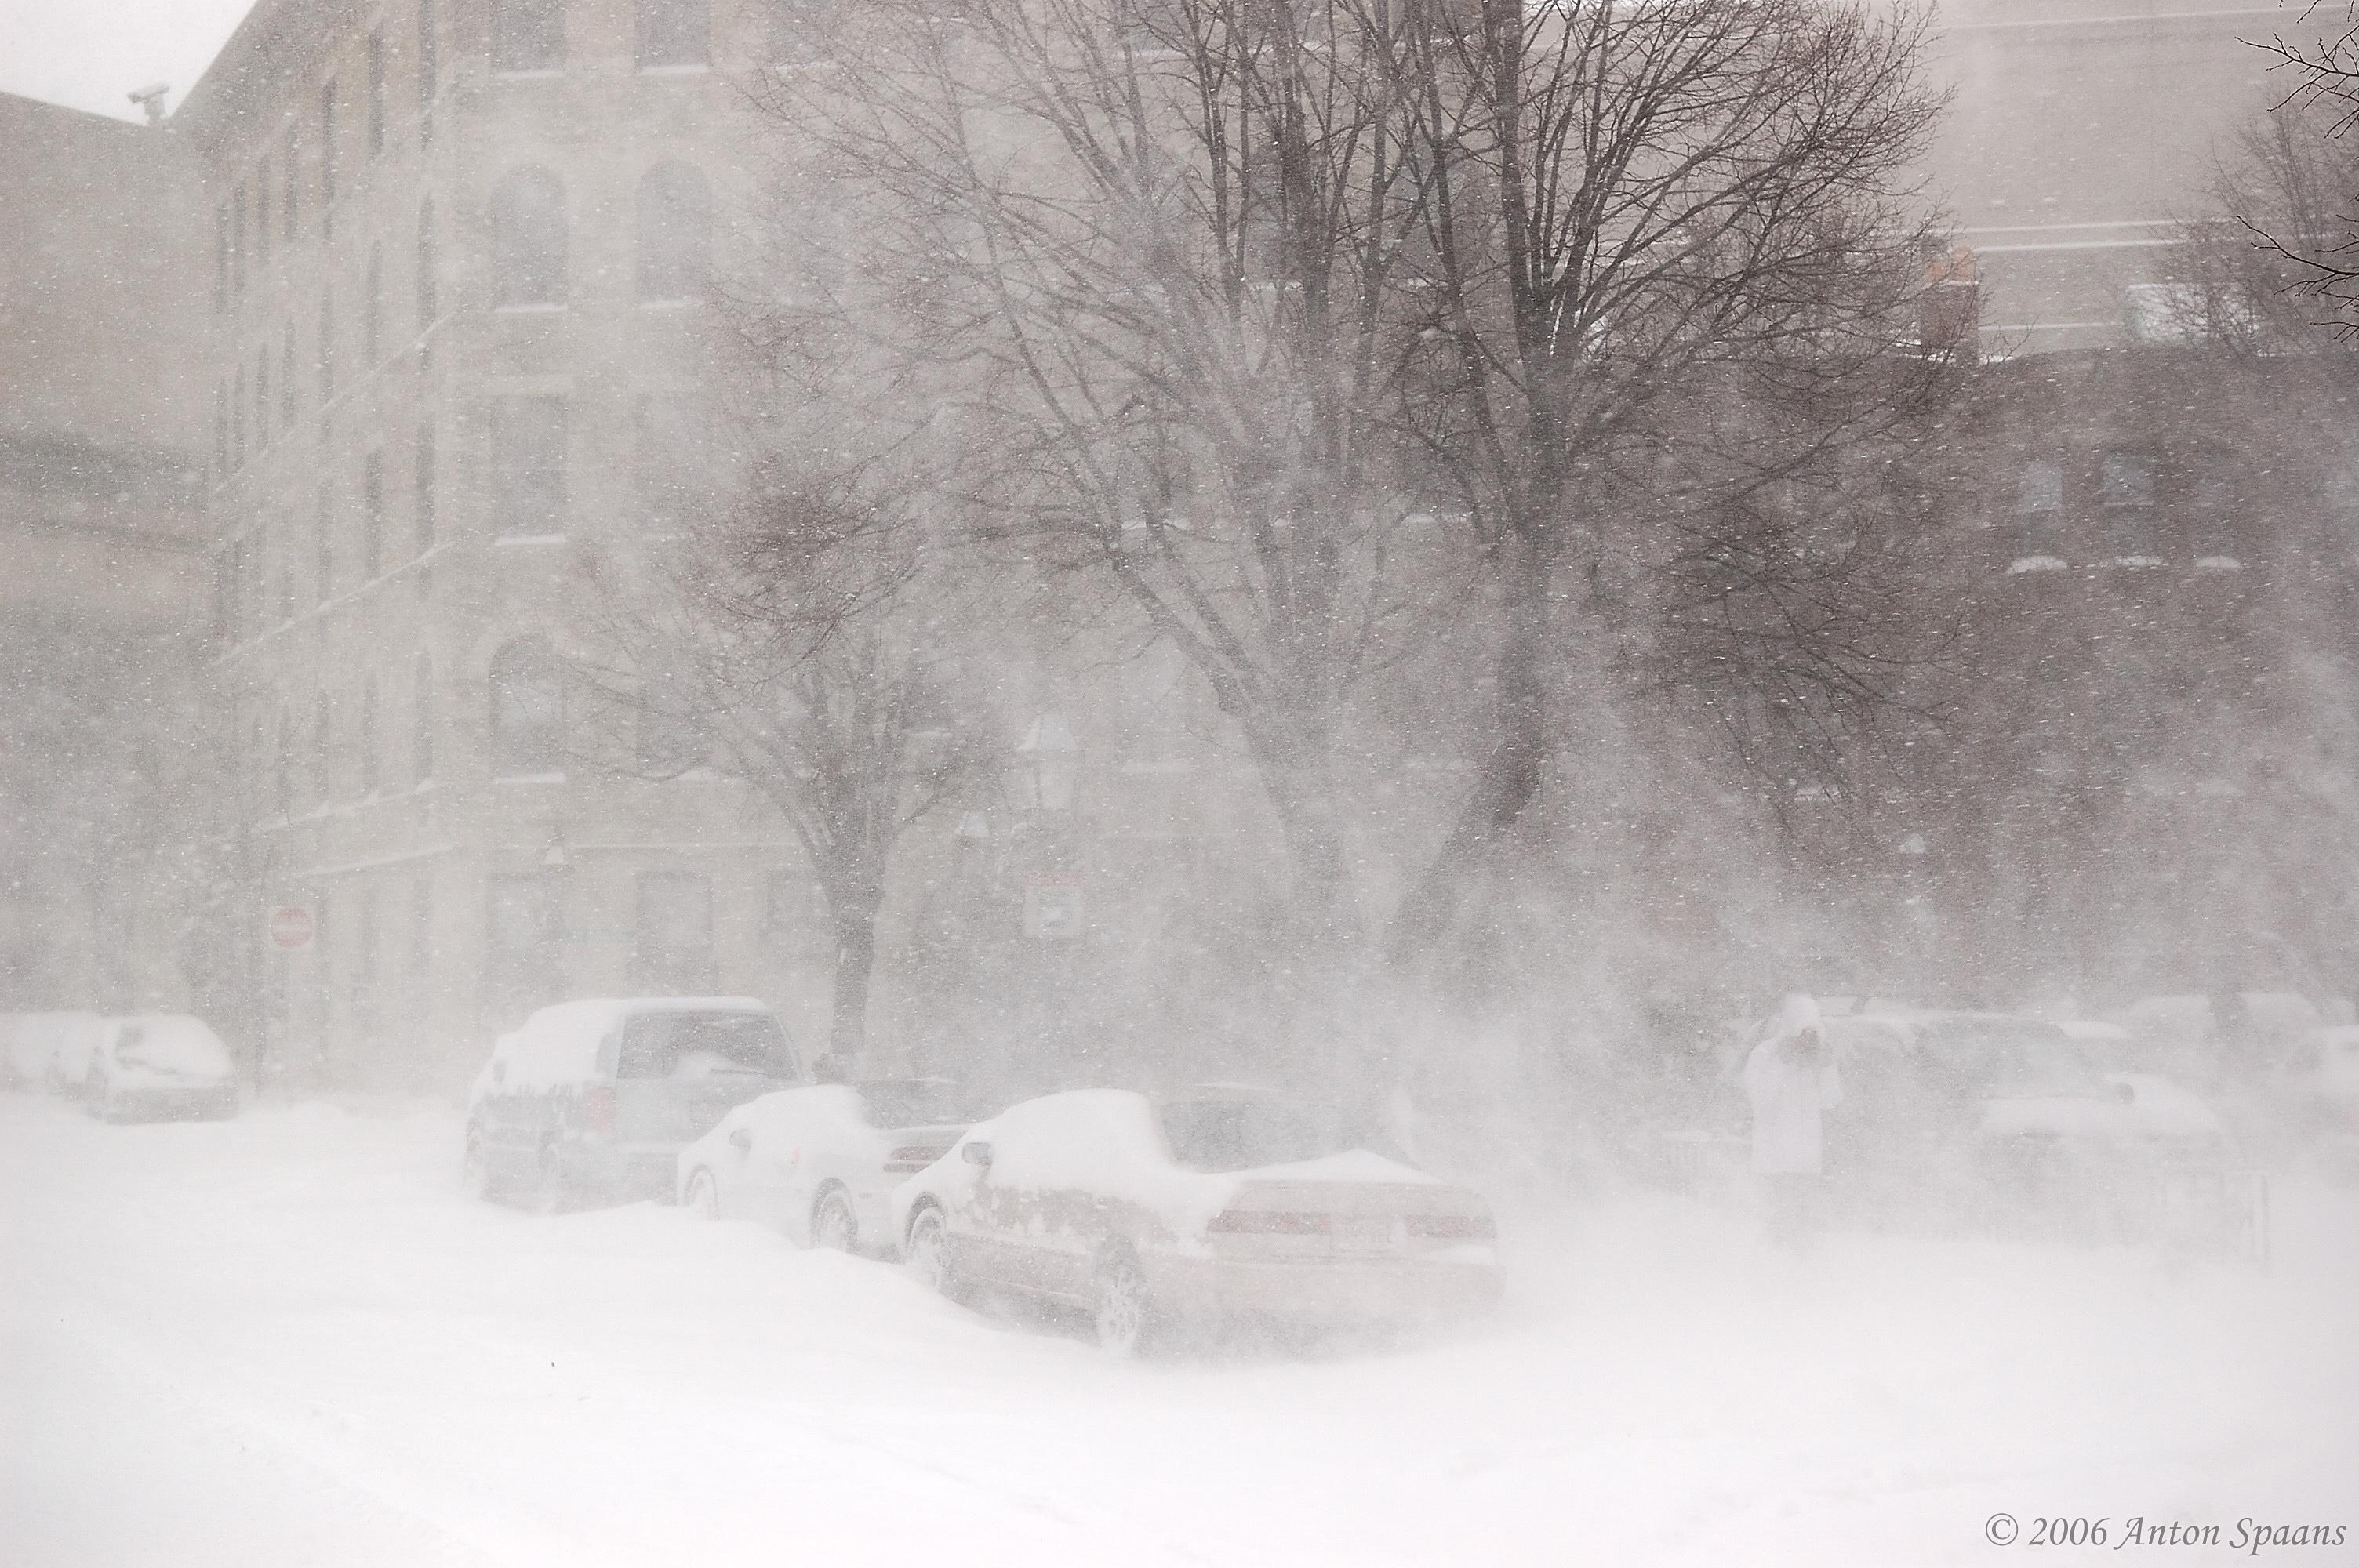 Boston Snow Storm Photos. Streets of Boston gt; Saint